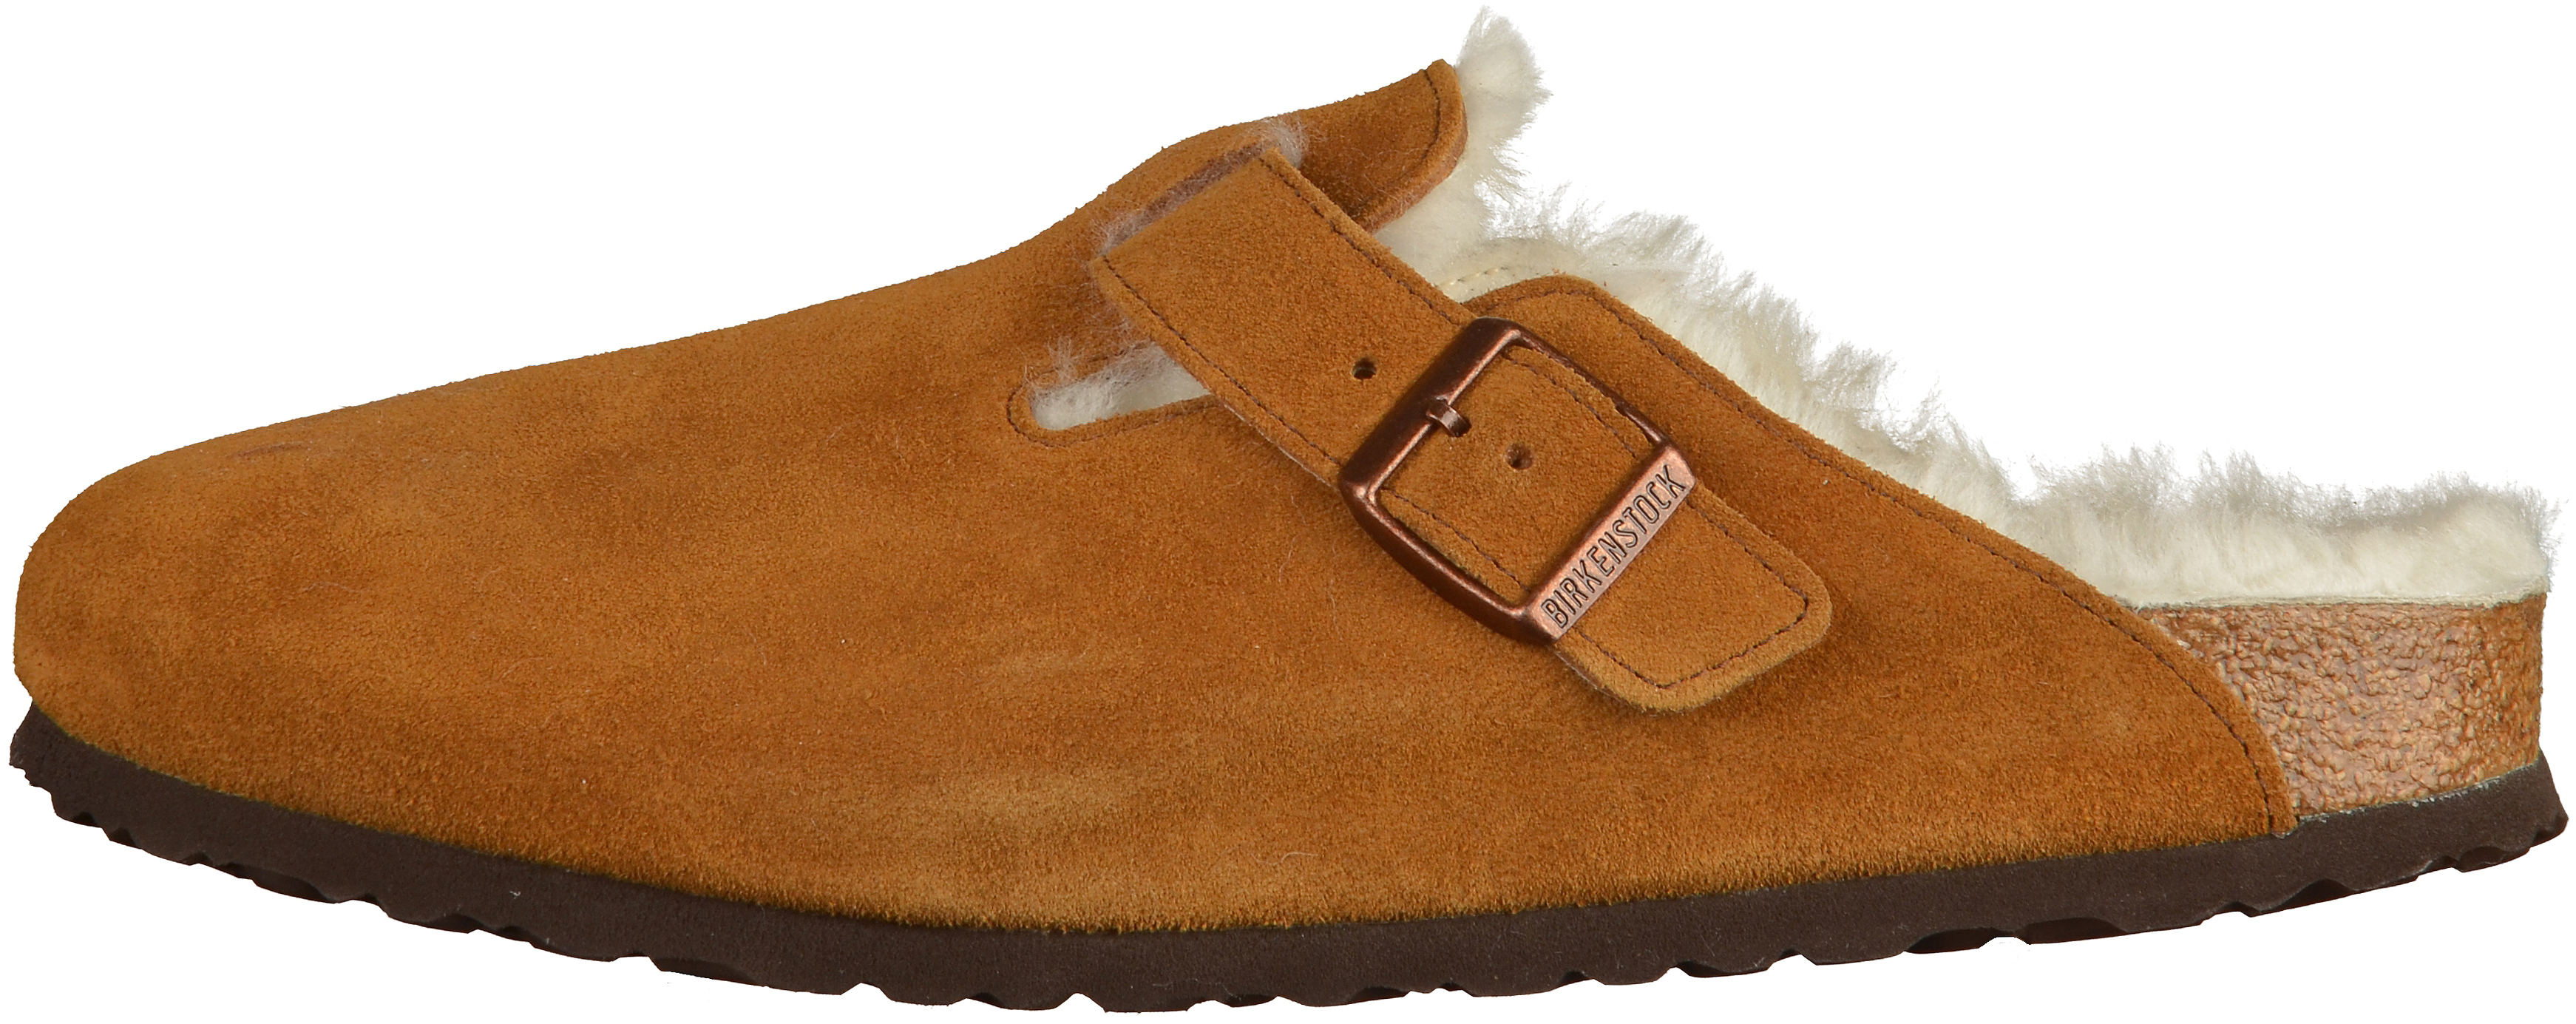 6cc6abef41 BIRKENSTOCK Boston Clogs Suede leather Mink